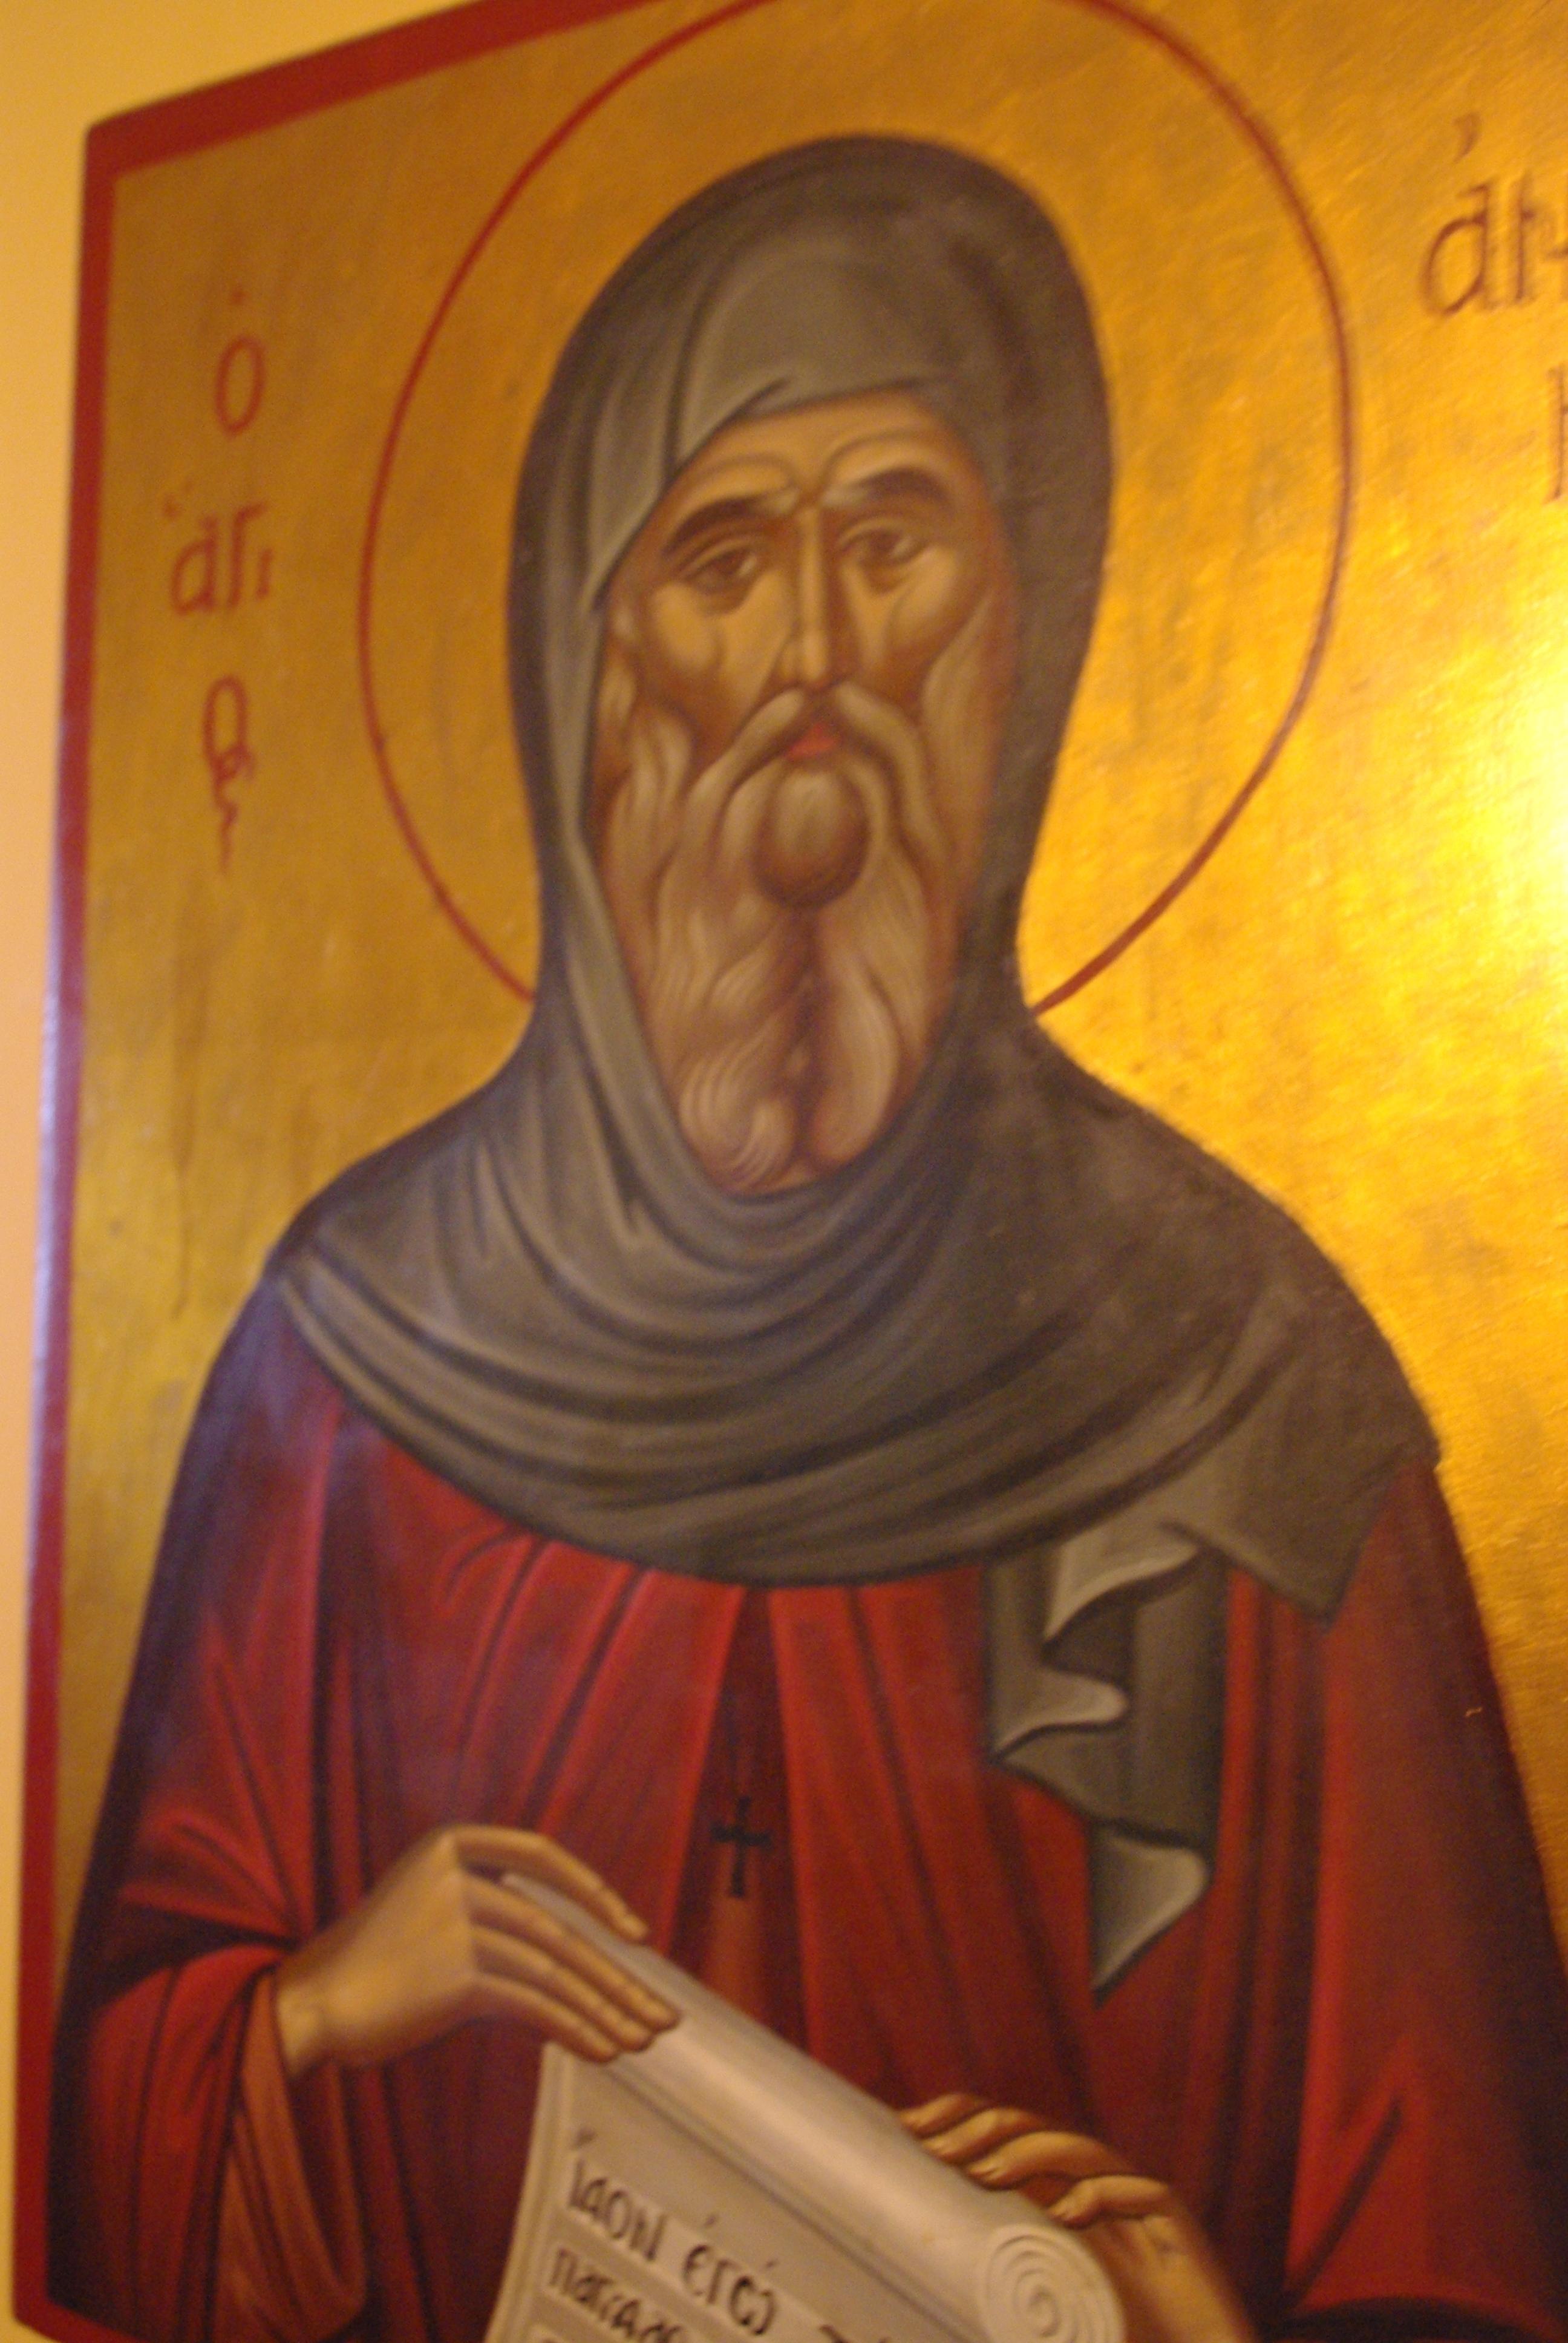 monasticism | The Modern Monastic Order Of Saint Simon of ...